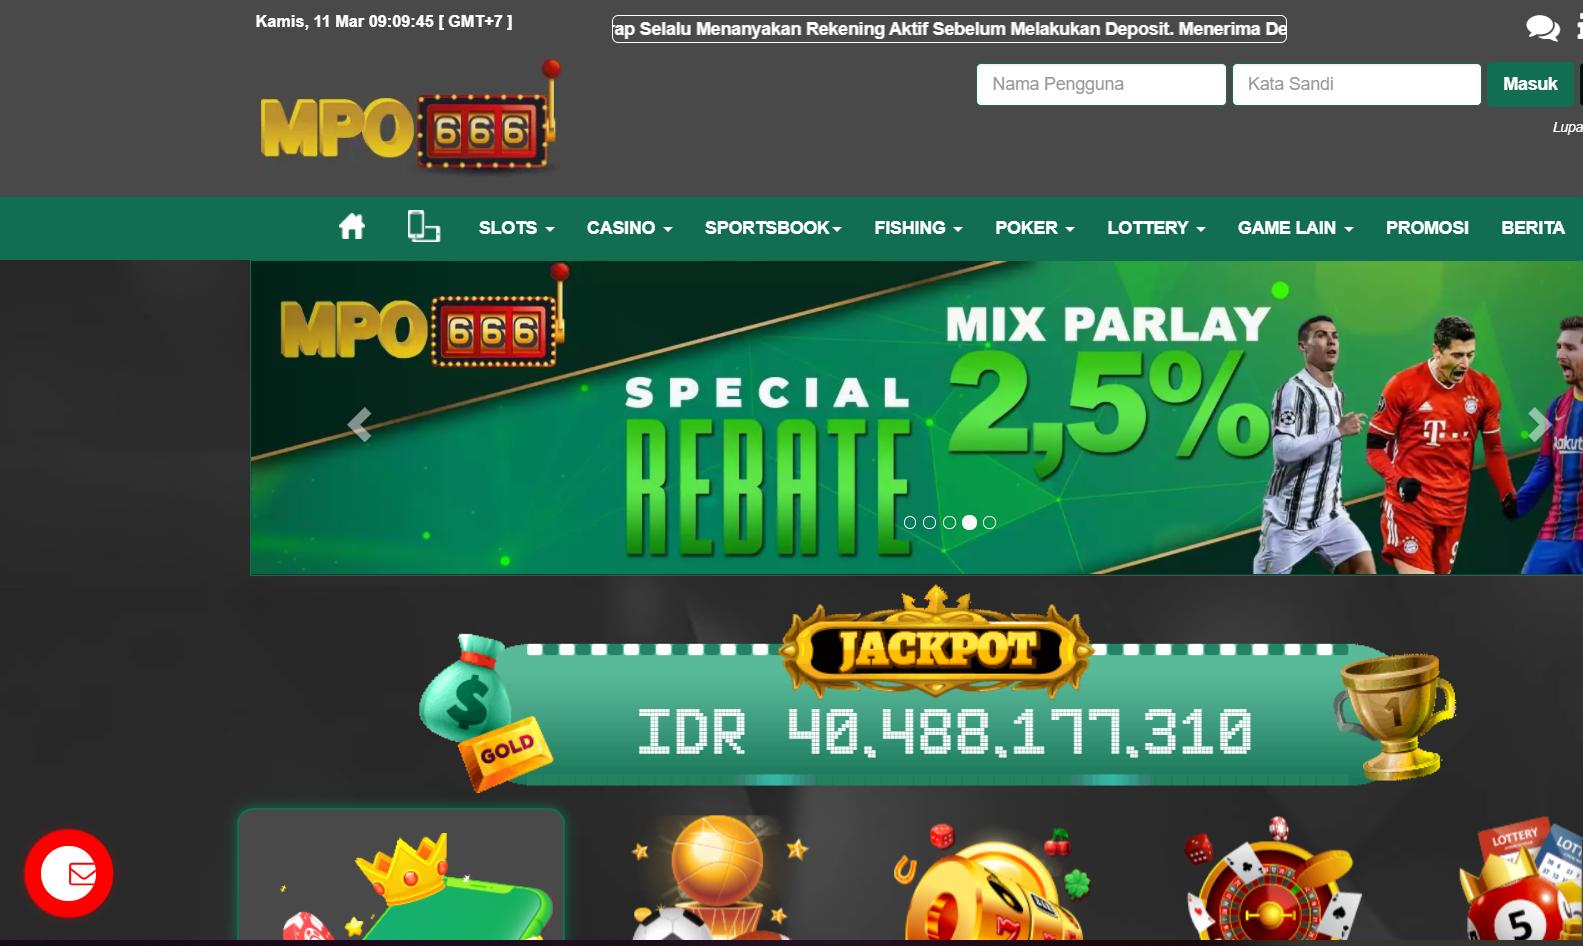 Mpo666 Slot Deposit Pulsa 5000 Mpo666 Slot Deposit Pulsa 5000 Profile Astct